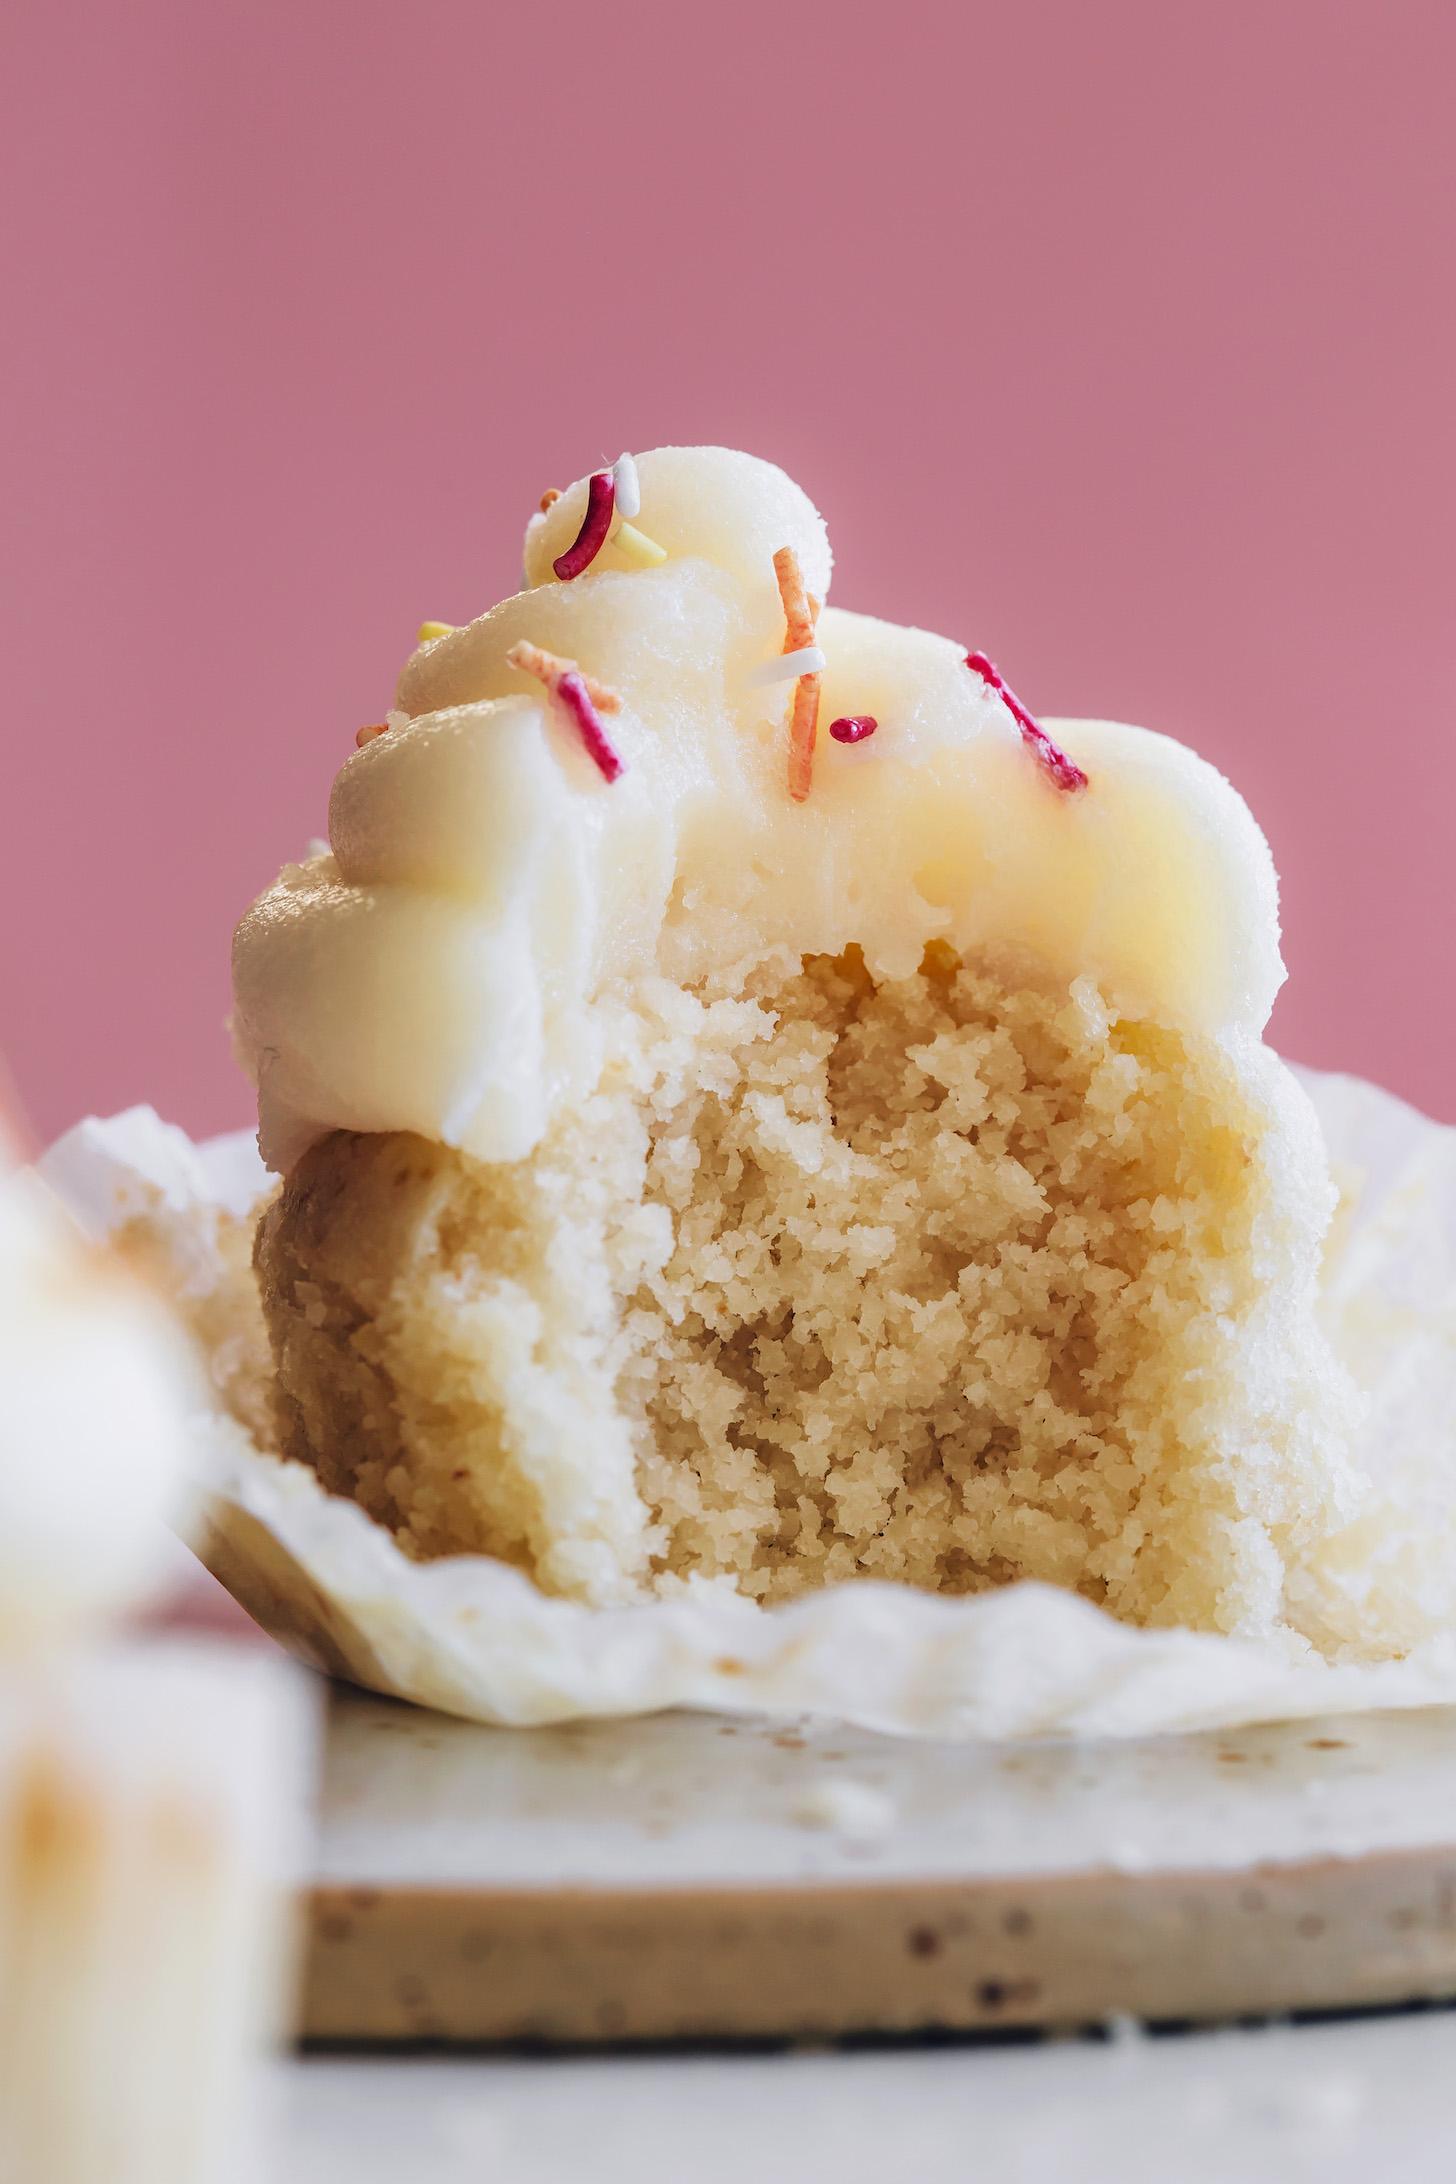 Partially eaten fluffy vegan vanilla cupcake